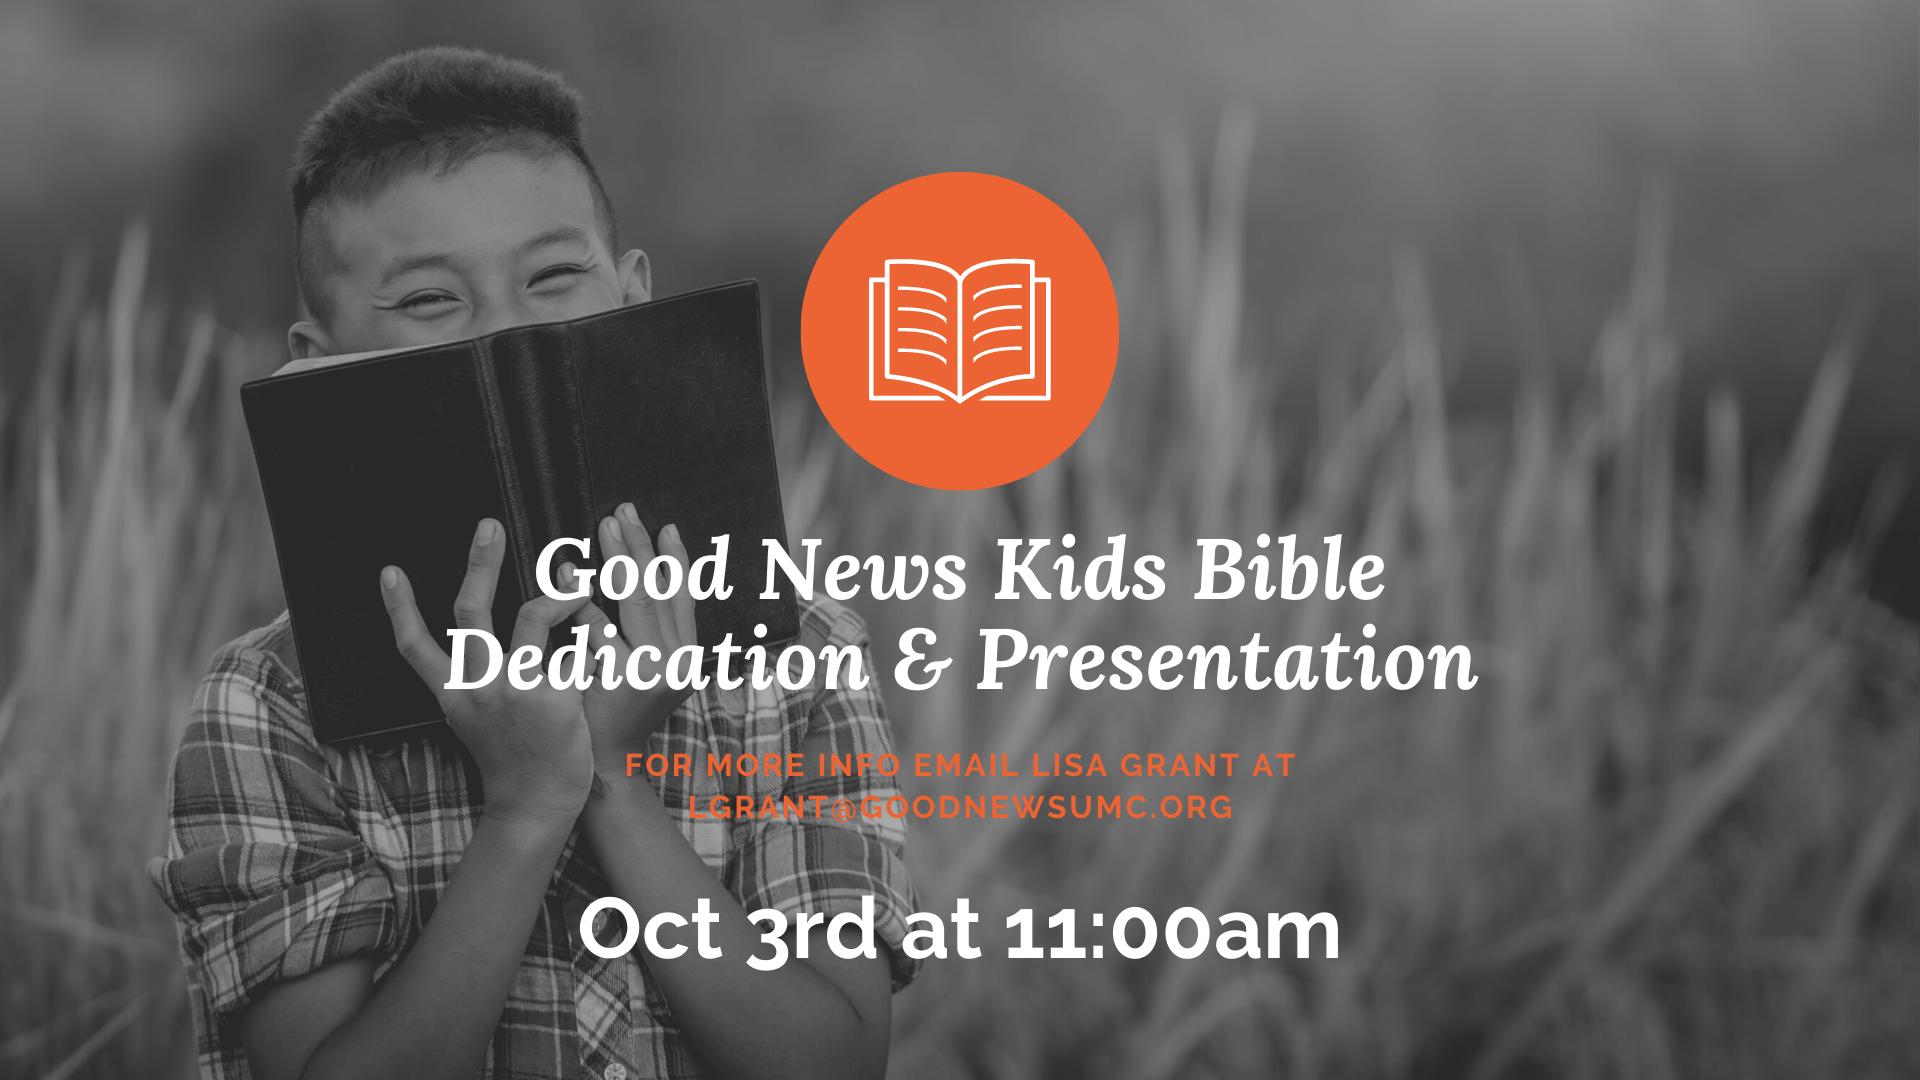 GN Kids Bible Dedication & Presentation